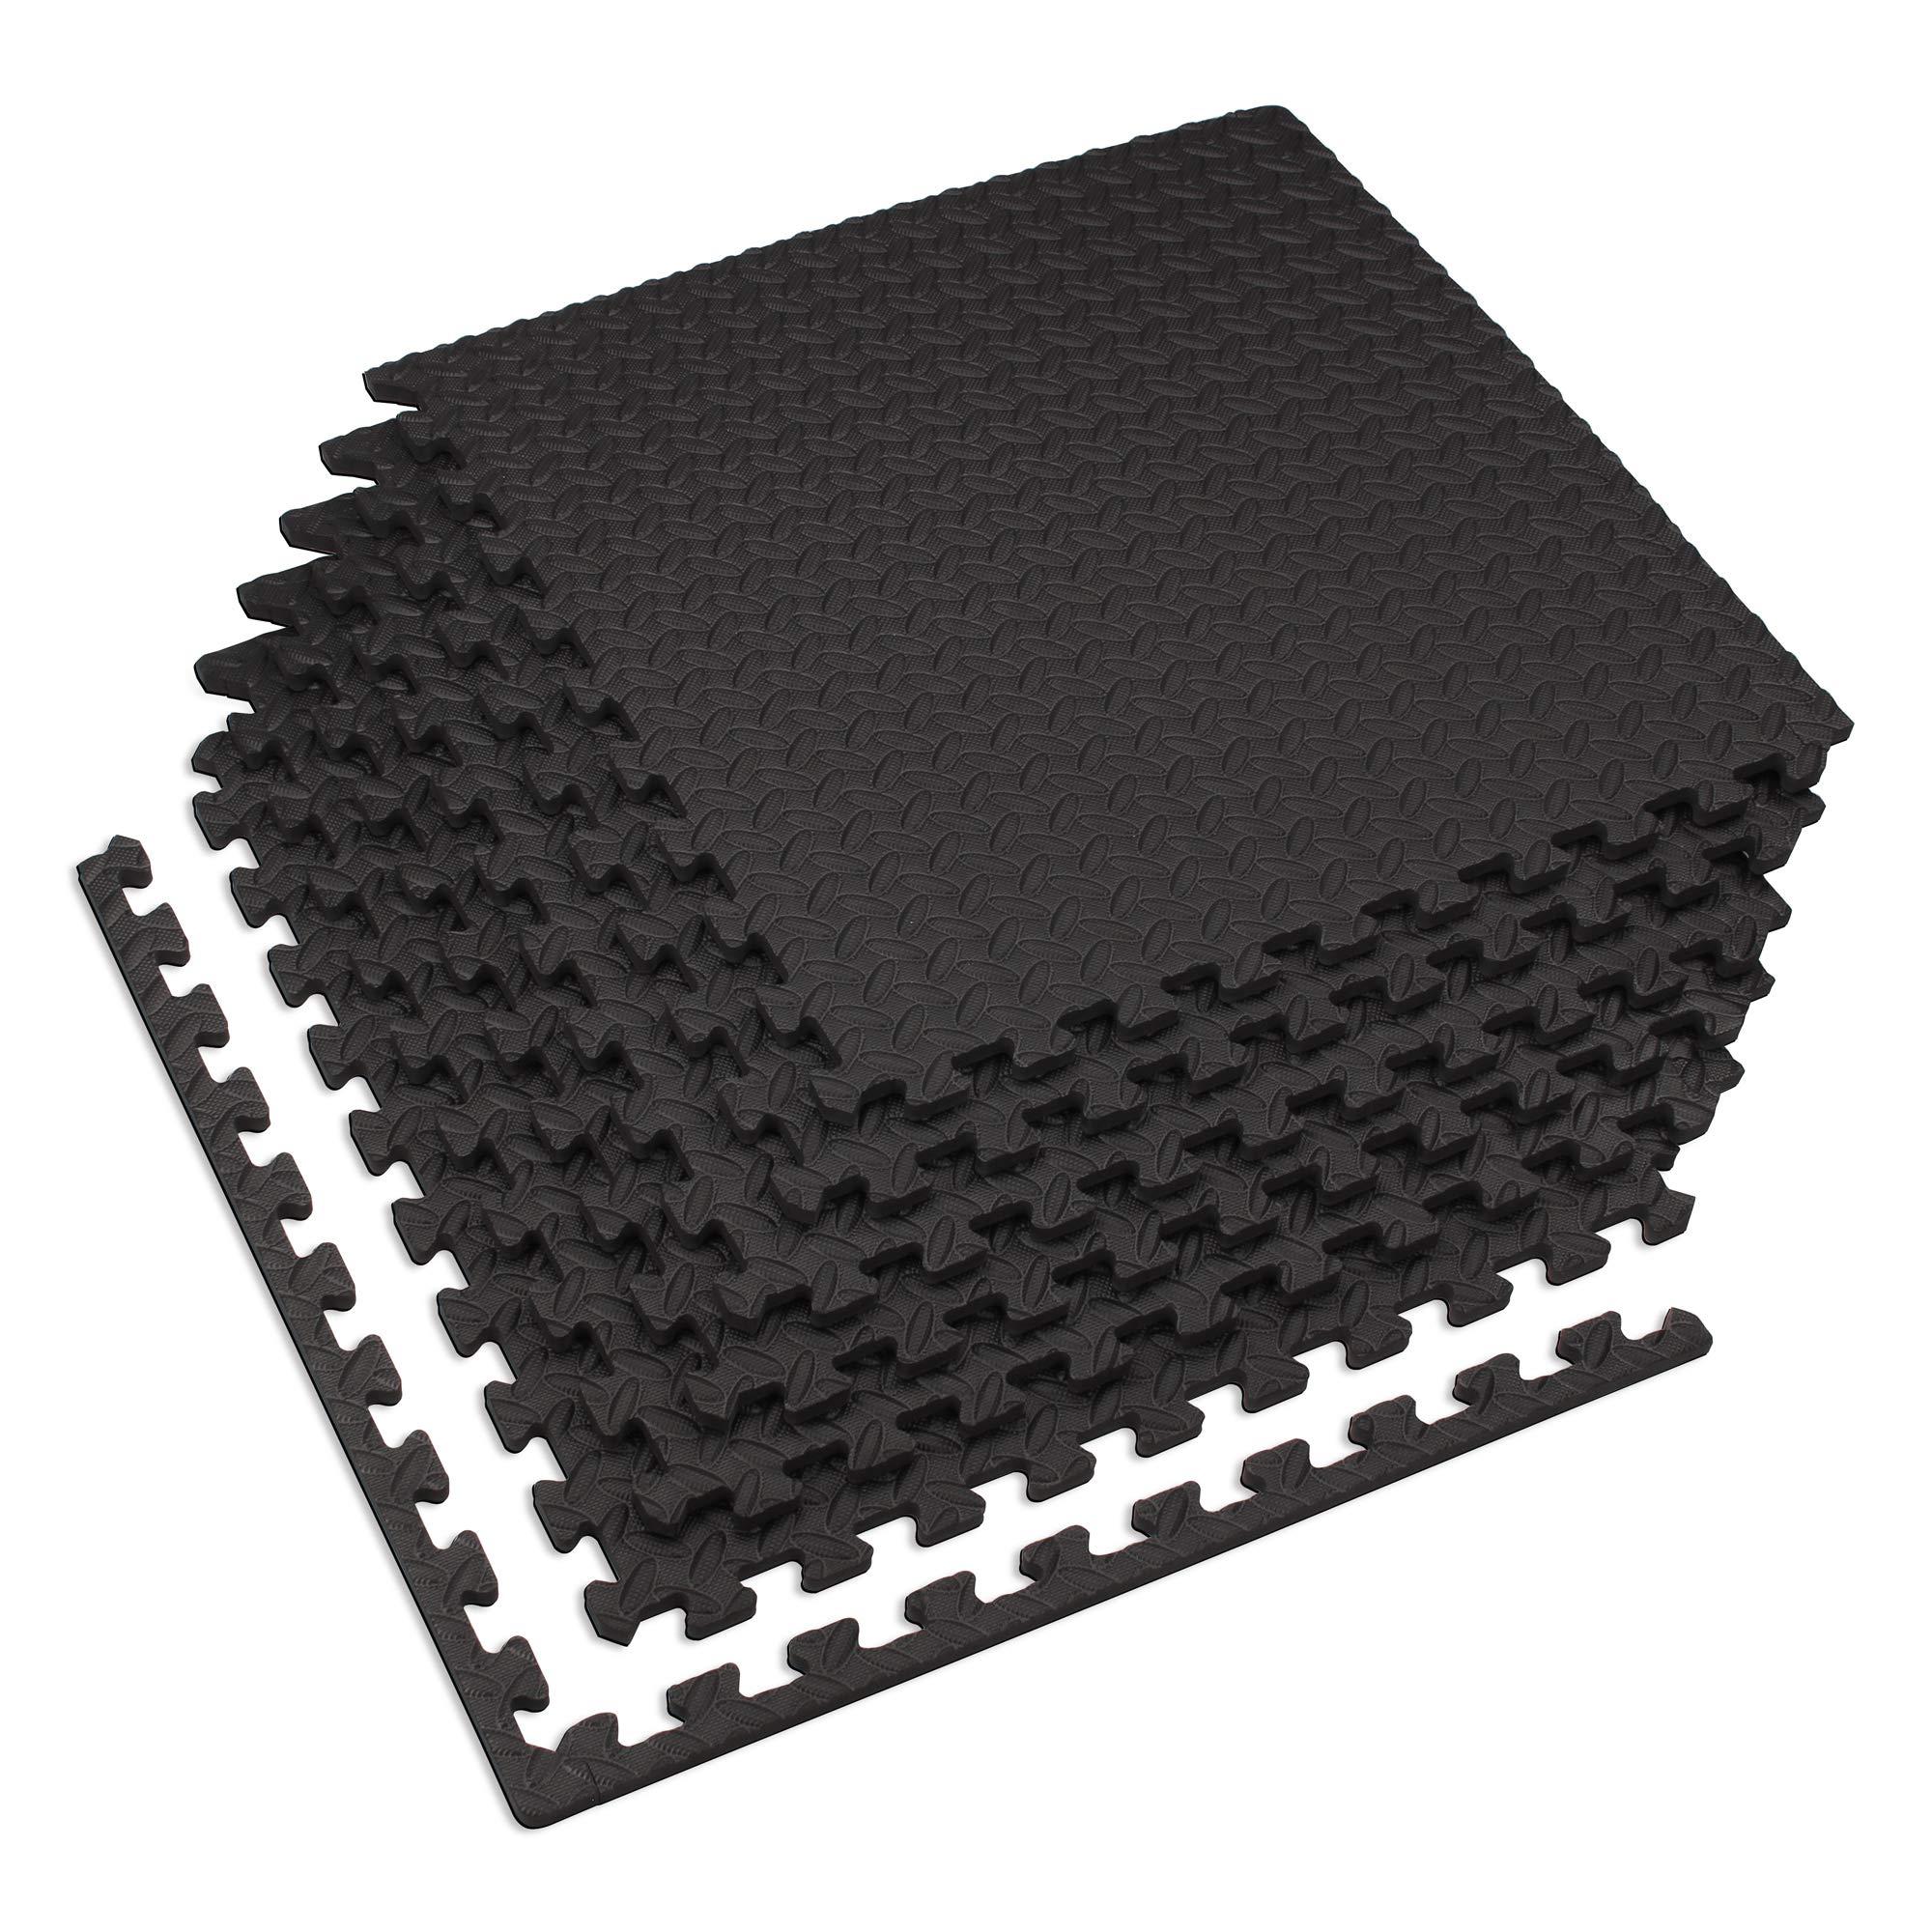 Velotas Black, 100 sq' (25 Tiles) Black 1/2'' Thick Interlocking Foam Fitness Mat